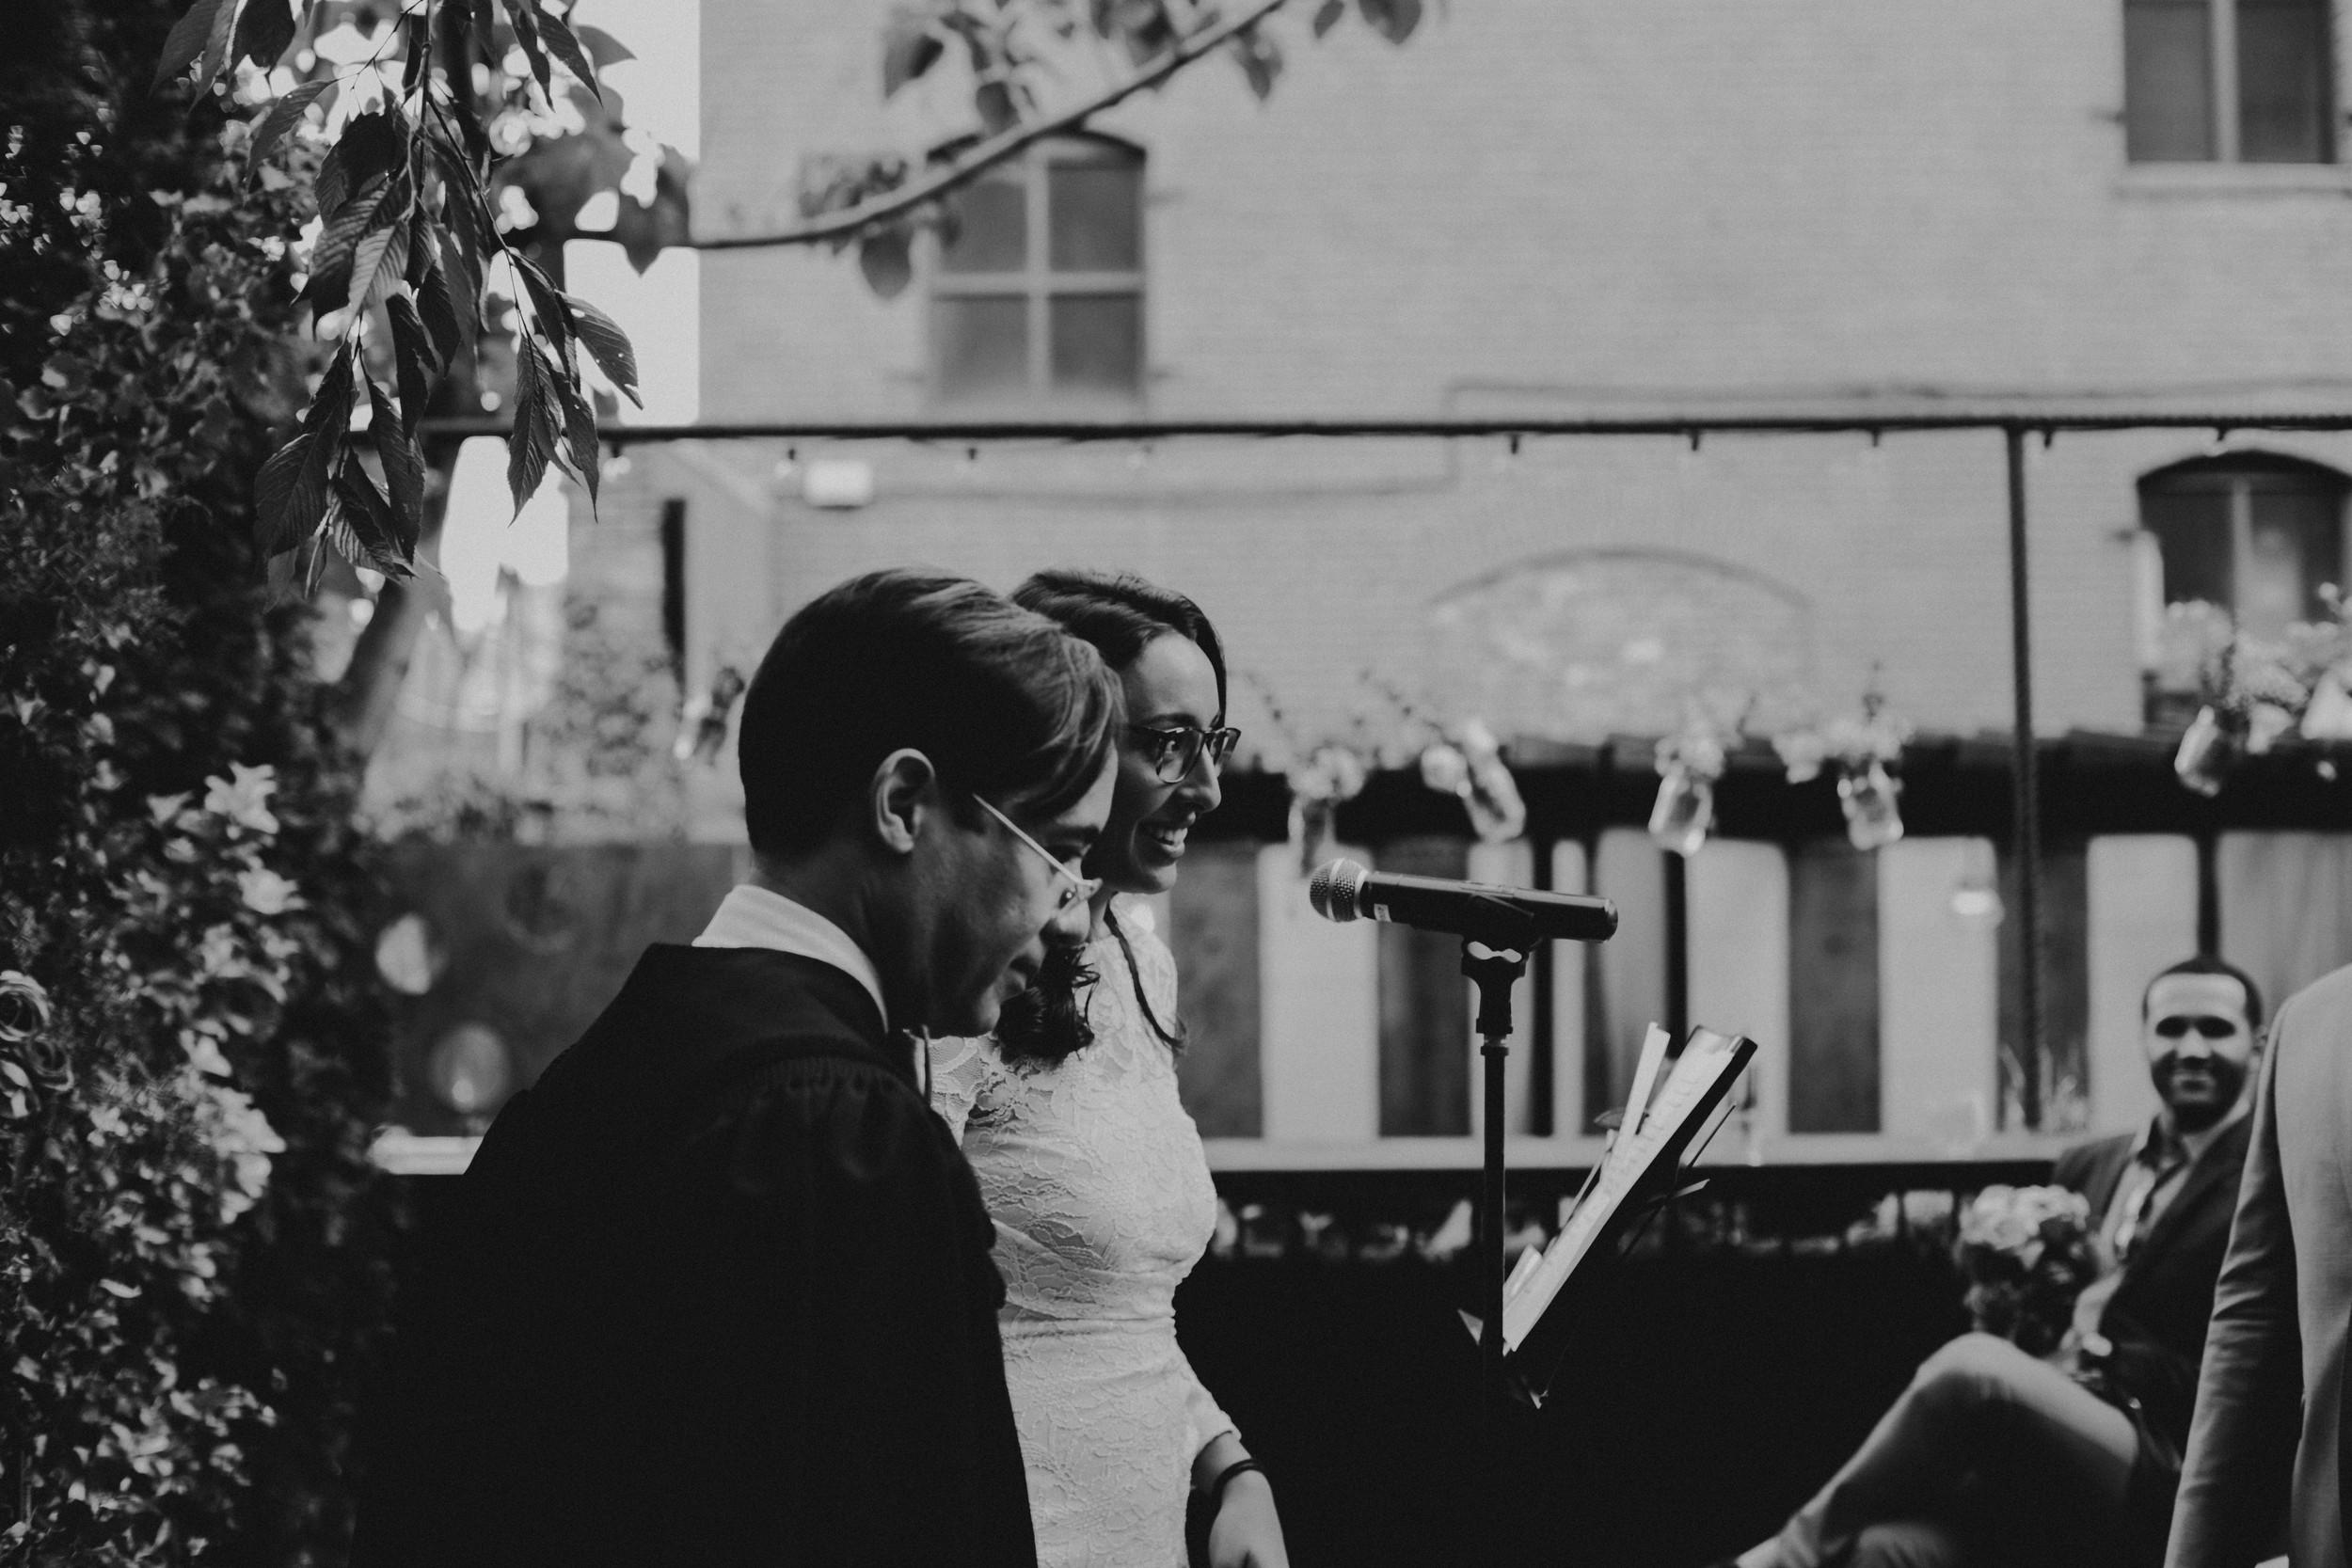 MY_MOON_WILLIAMSBURG_WEDDING 2511.jpg